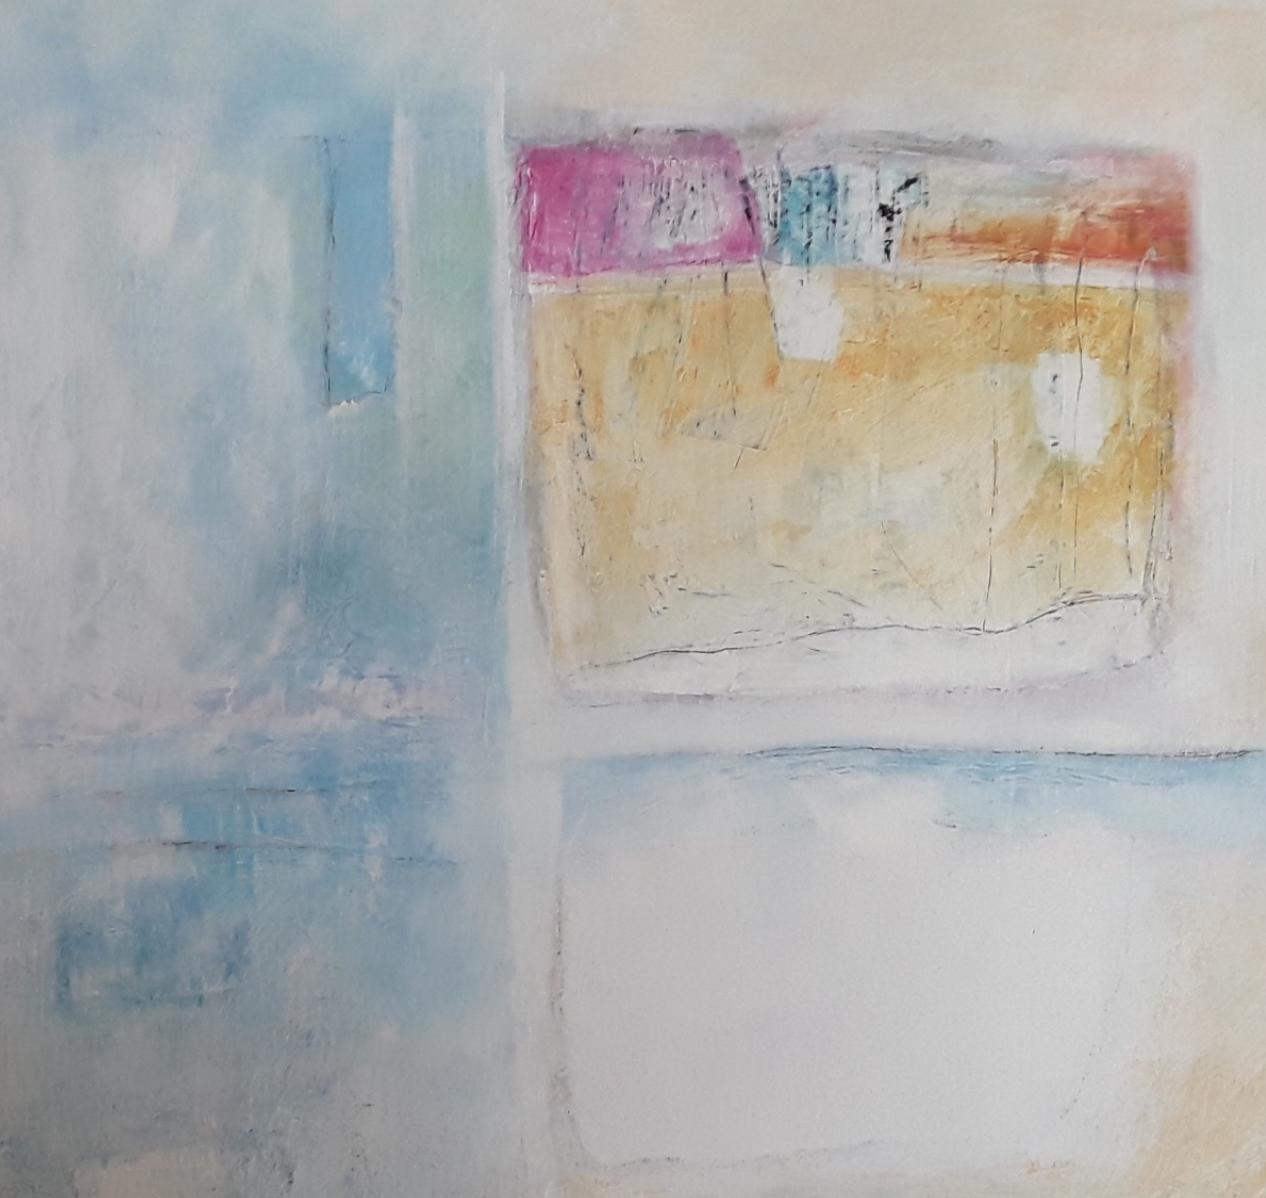 Swarthmoor Hall Artists – Winter Exhibition